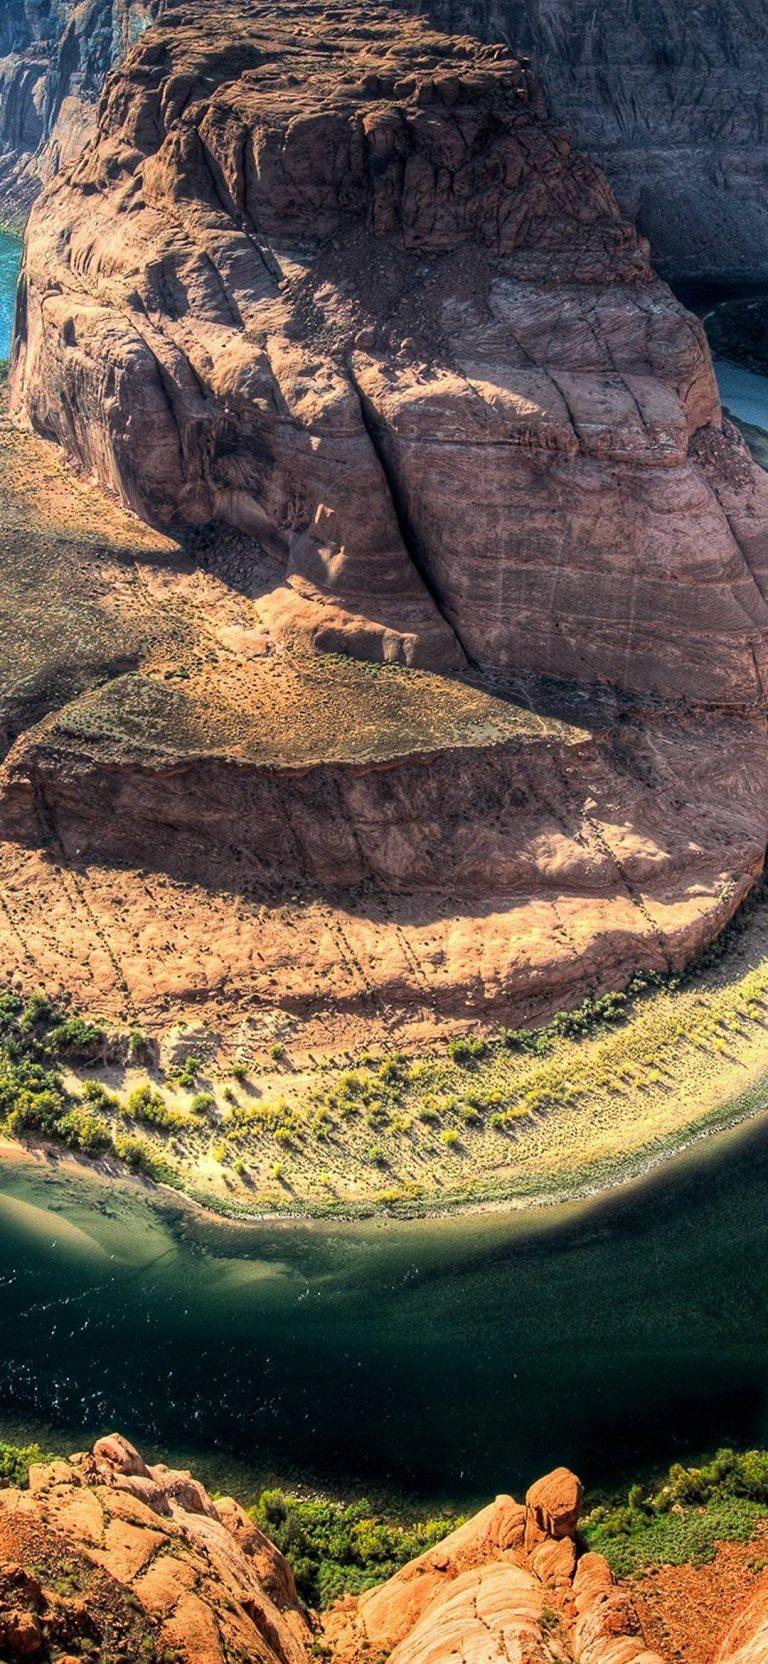 Water Nature Canyon Cliffs Horseshoe 1080x2340 768x1664